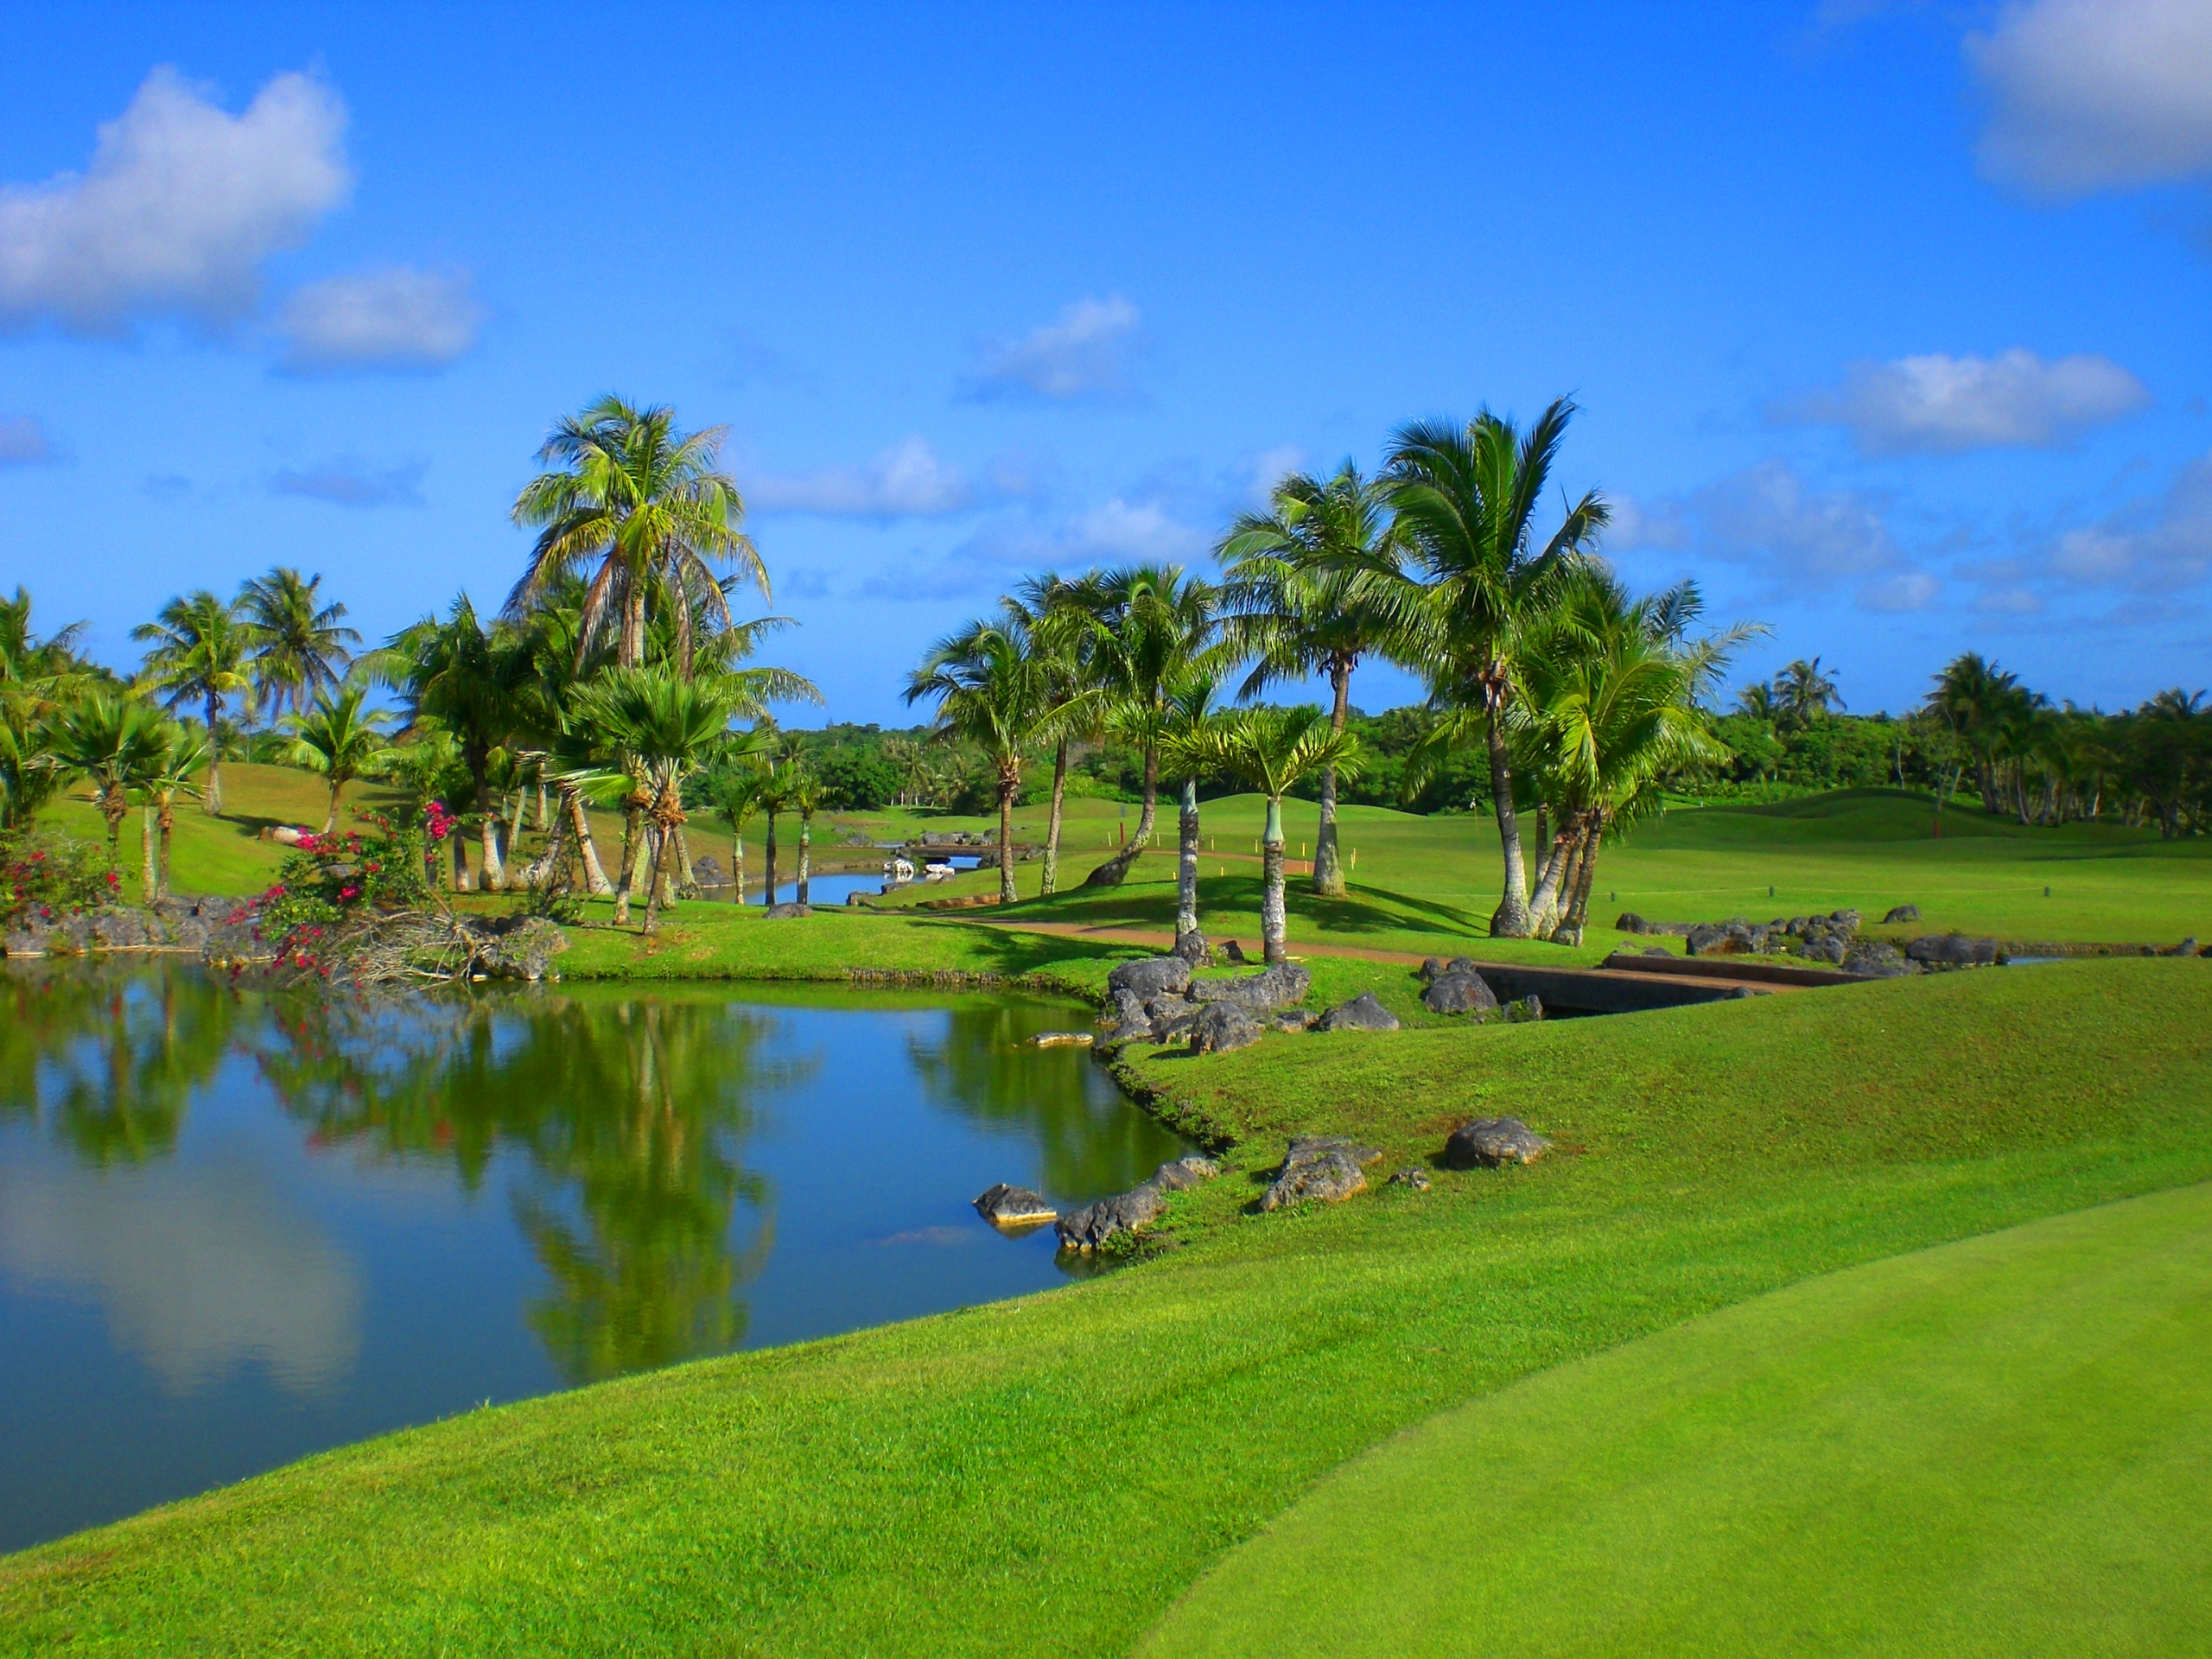 Guam International Country Club Guam - Is guam a country